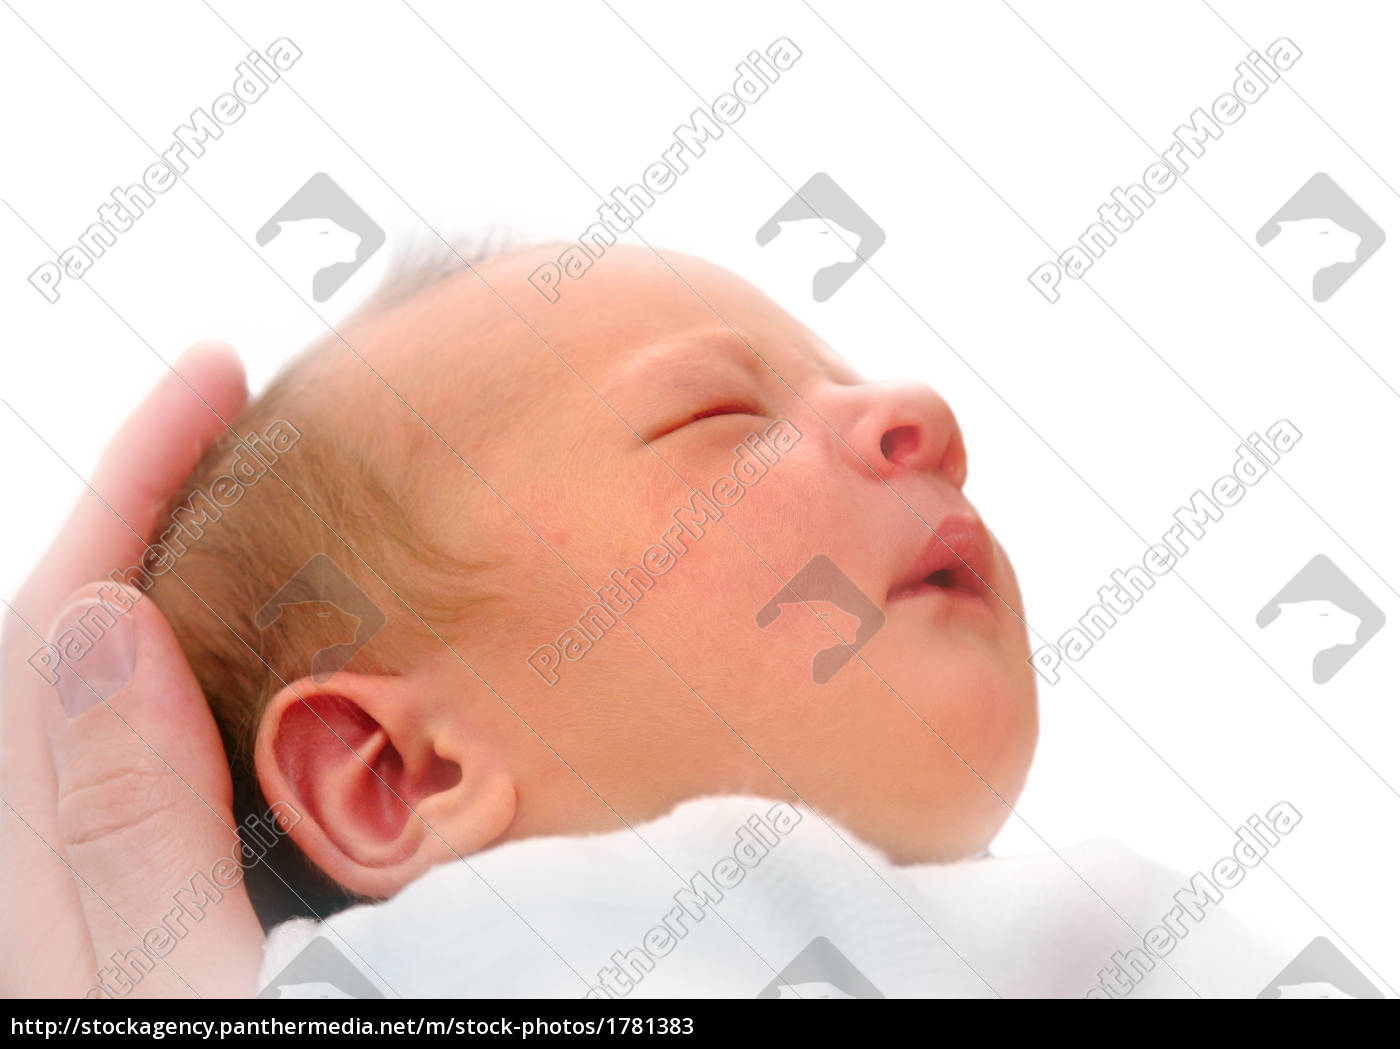 newborn, in, father's, hand - 1781383